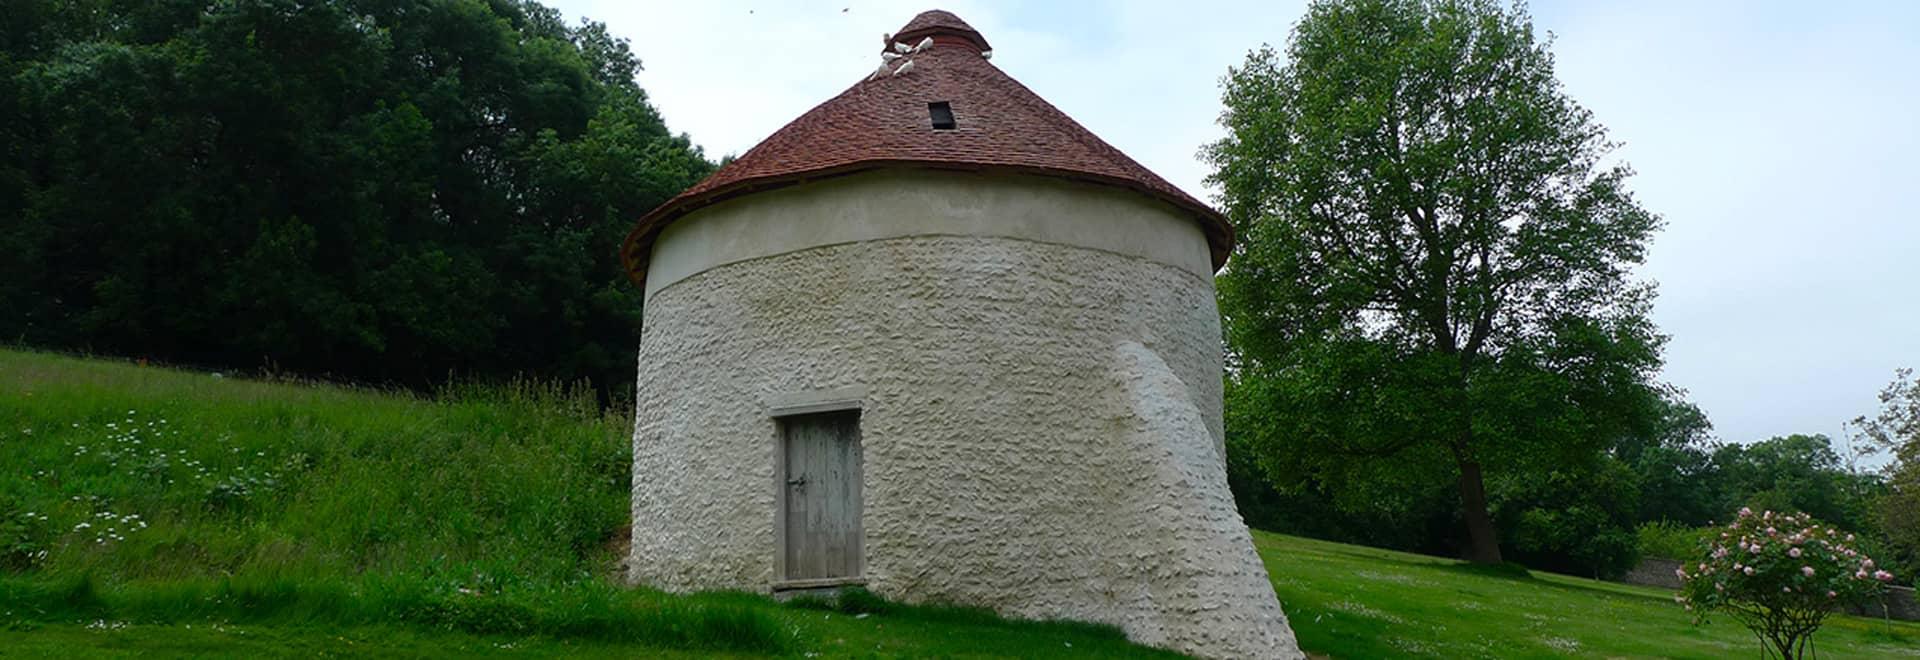 Ancient Stone Circular Hut